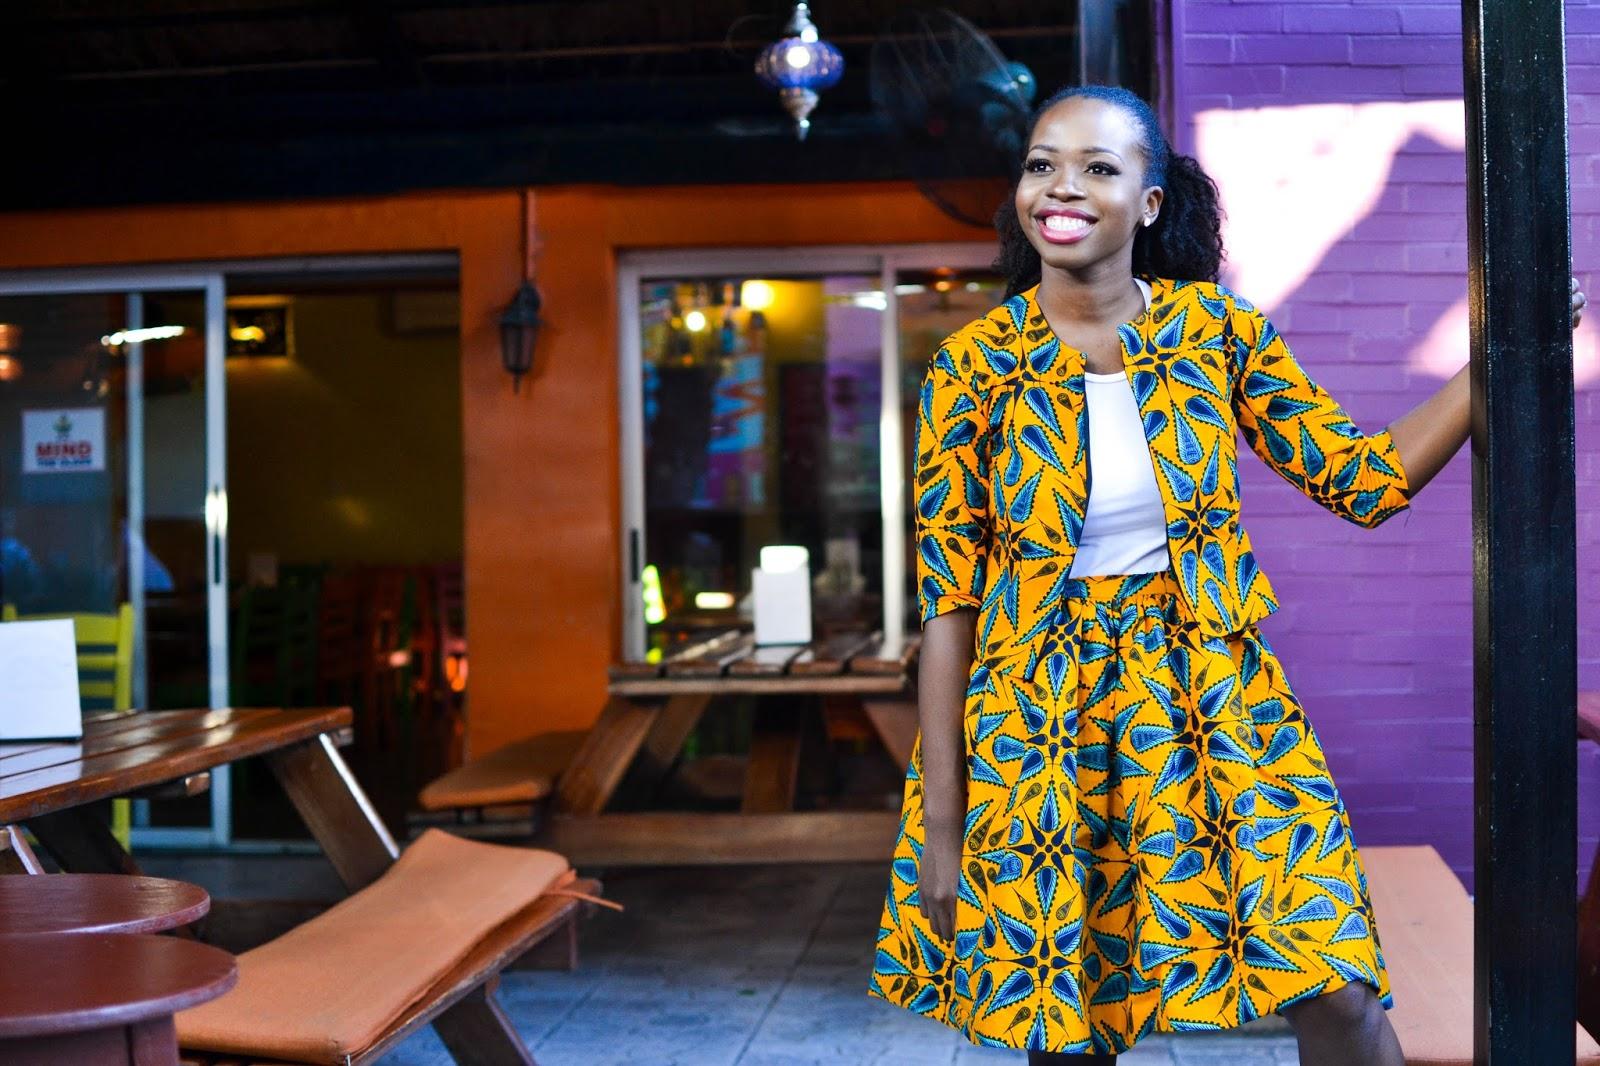 Yellow Ankara Two Piece on an African Fashion Blogger